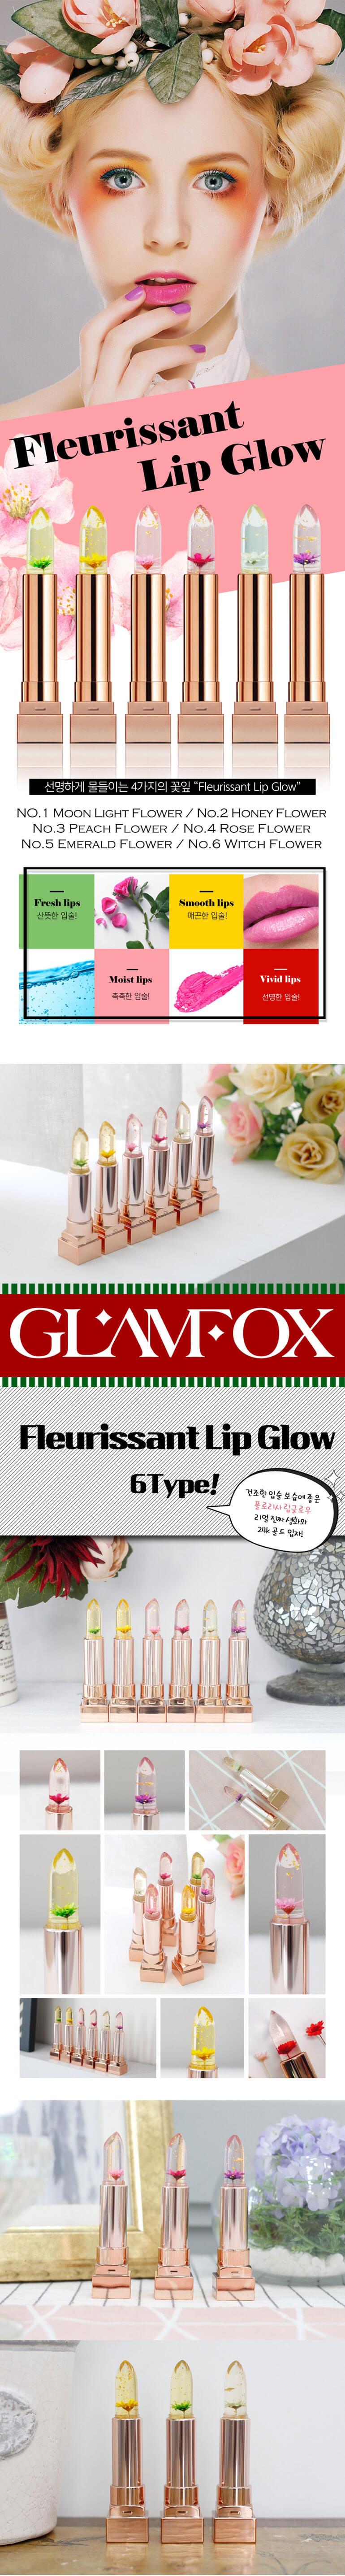 glamfox Fleurissant Lip Glow